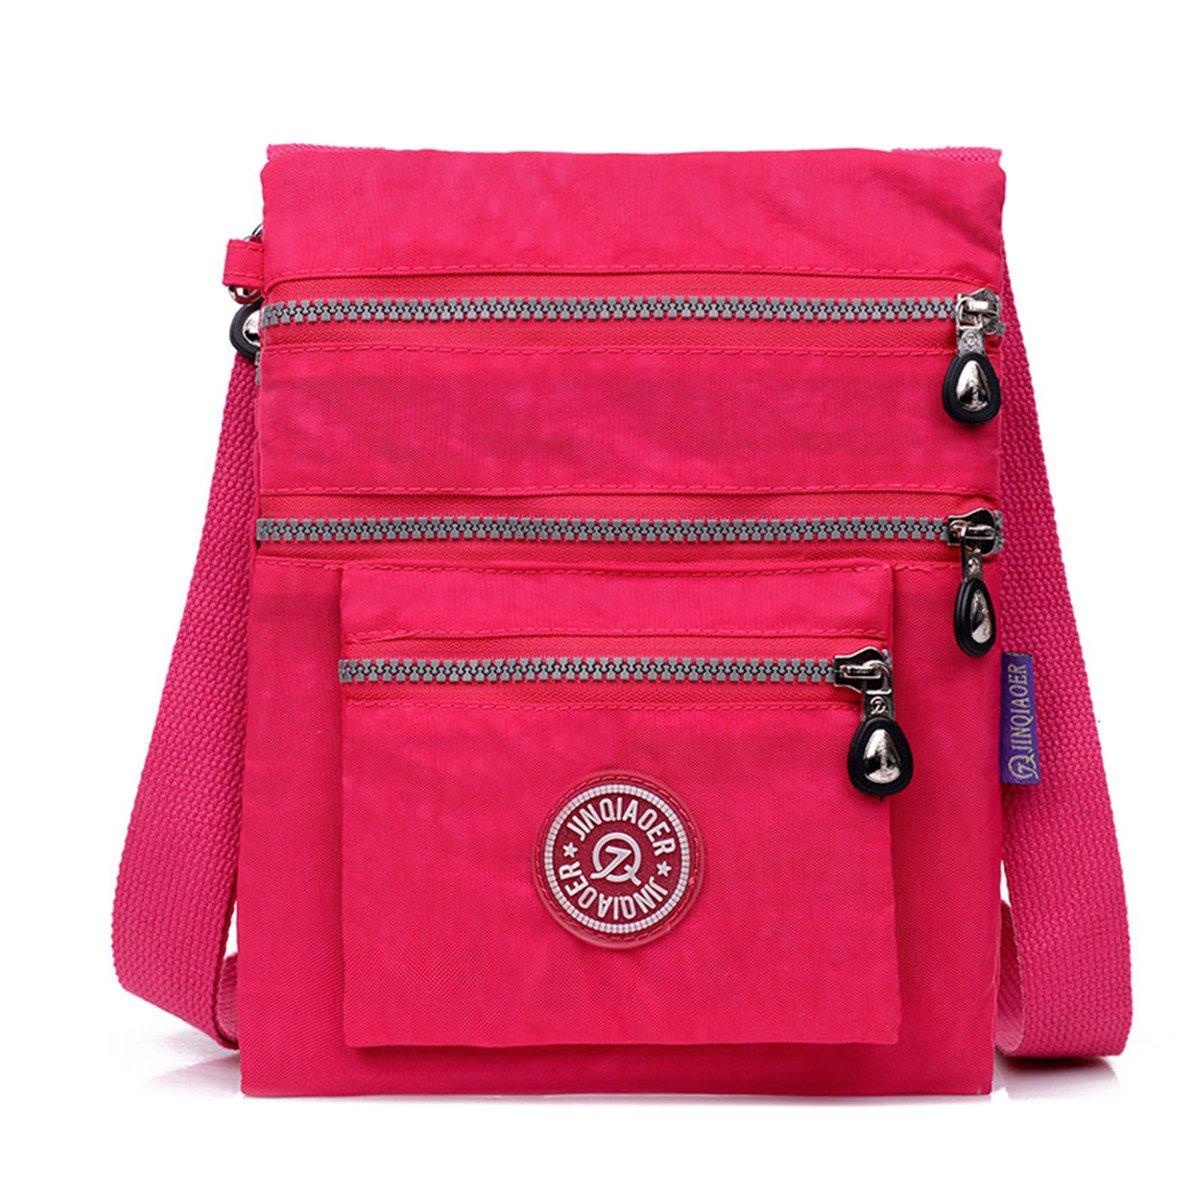 TianHengYi Small Water Resistant Nylon Cross-body Shoulder Bag Multilayers Rose